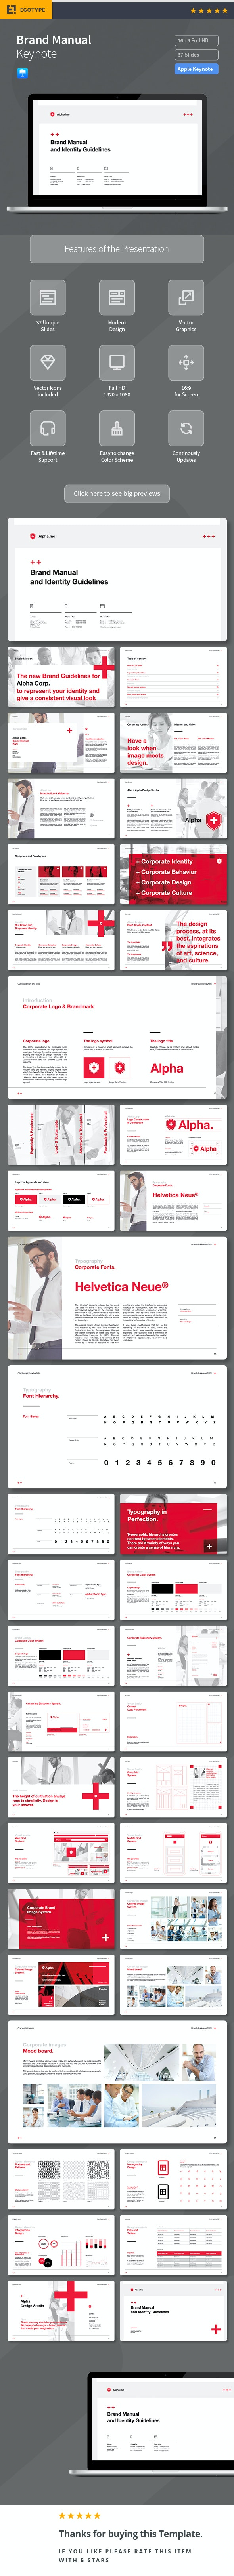 Brand Manual Keynote - Keynote Templates Presentation Templates